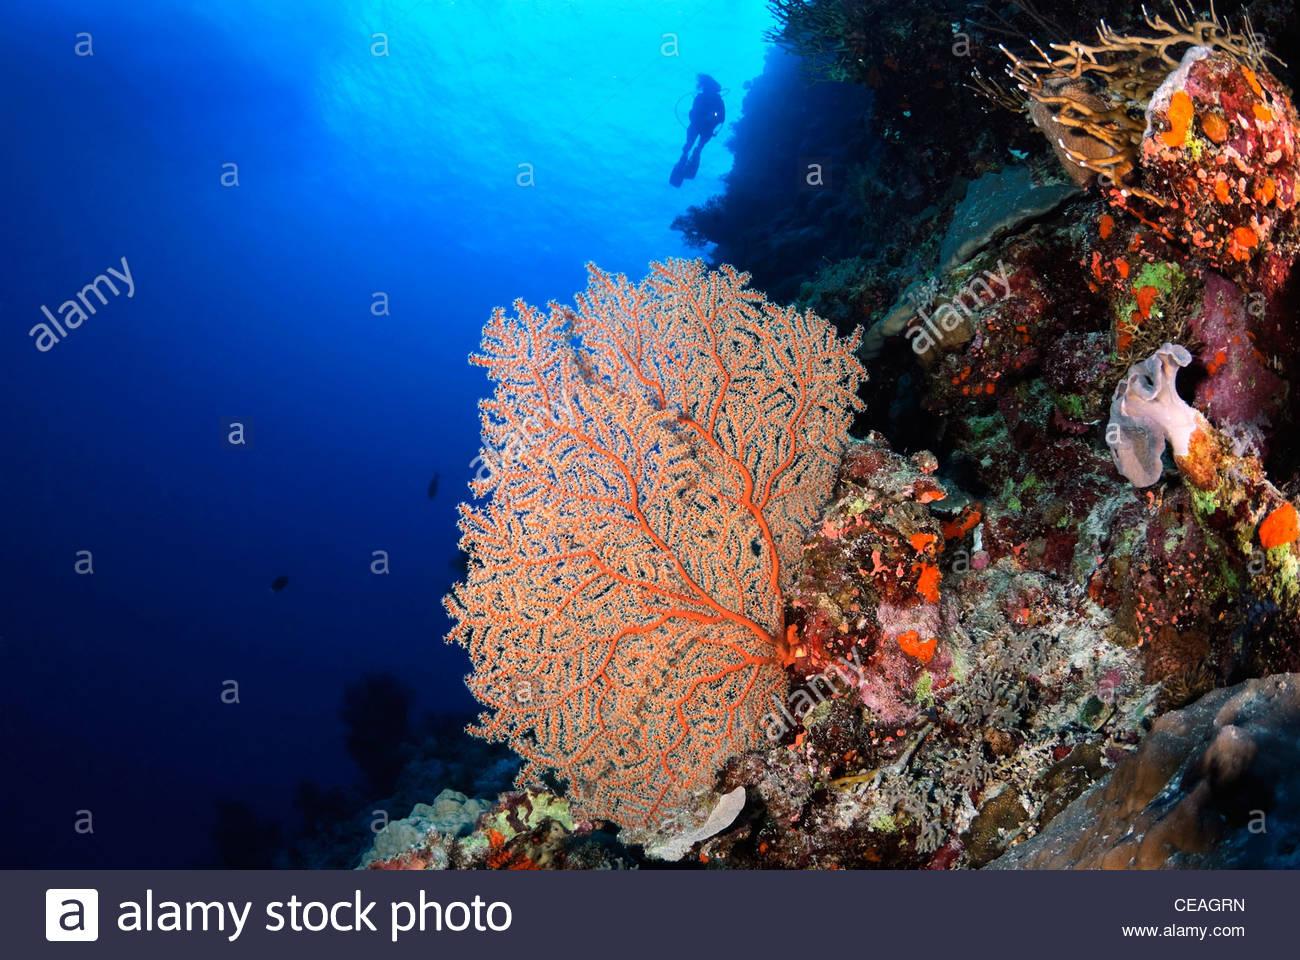 Coral Reef, Great Barrier Reef Queensland Australia - Stock Image